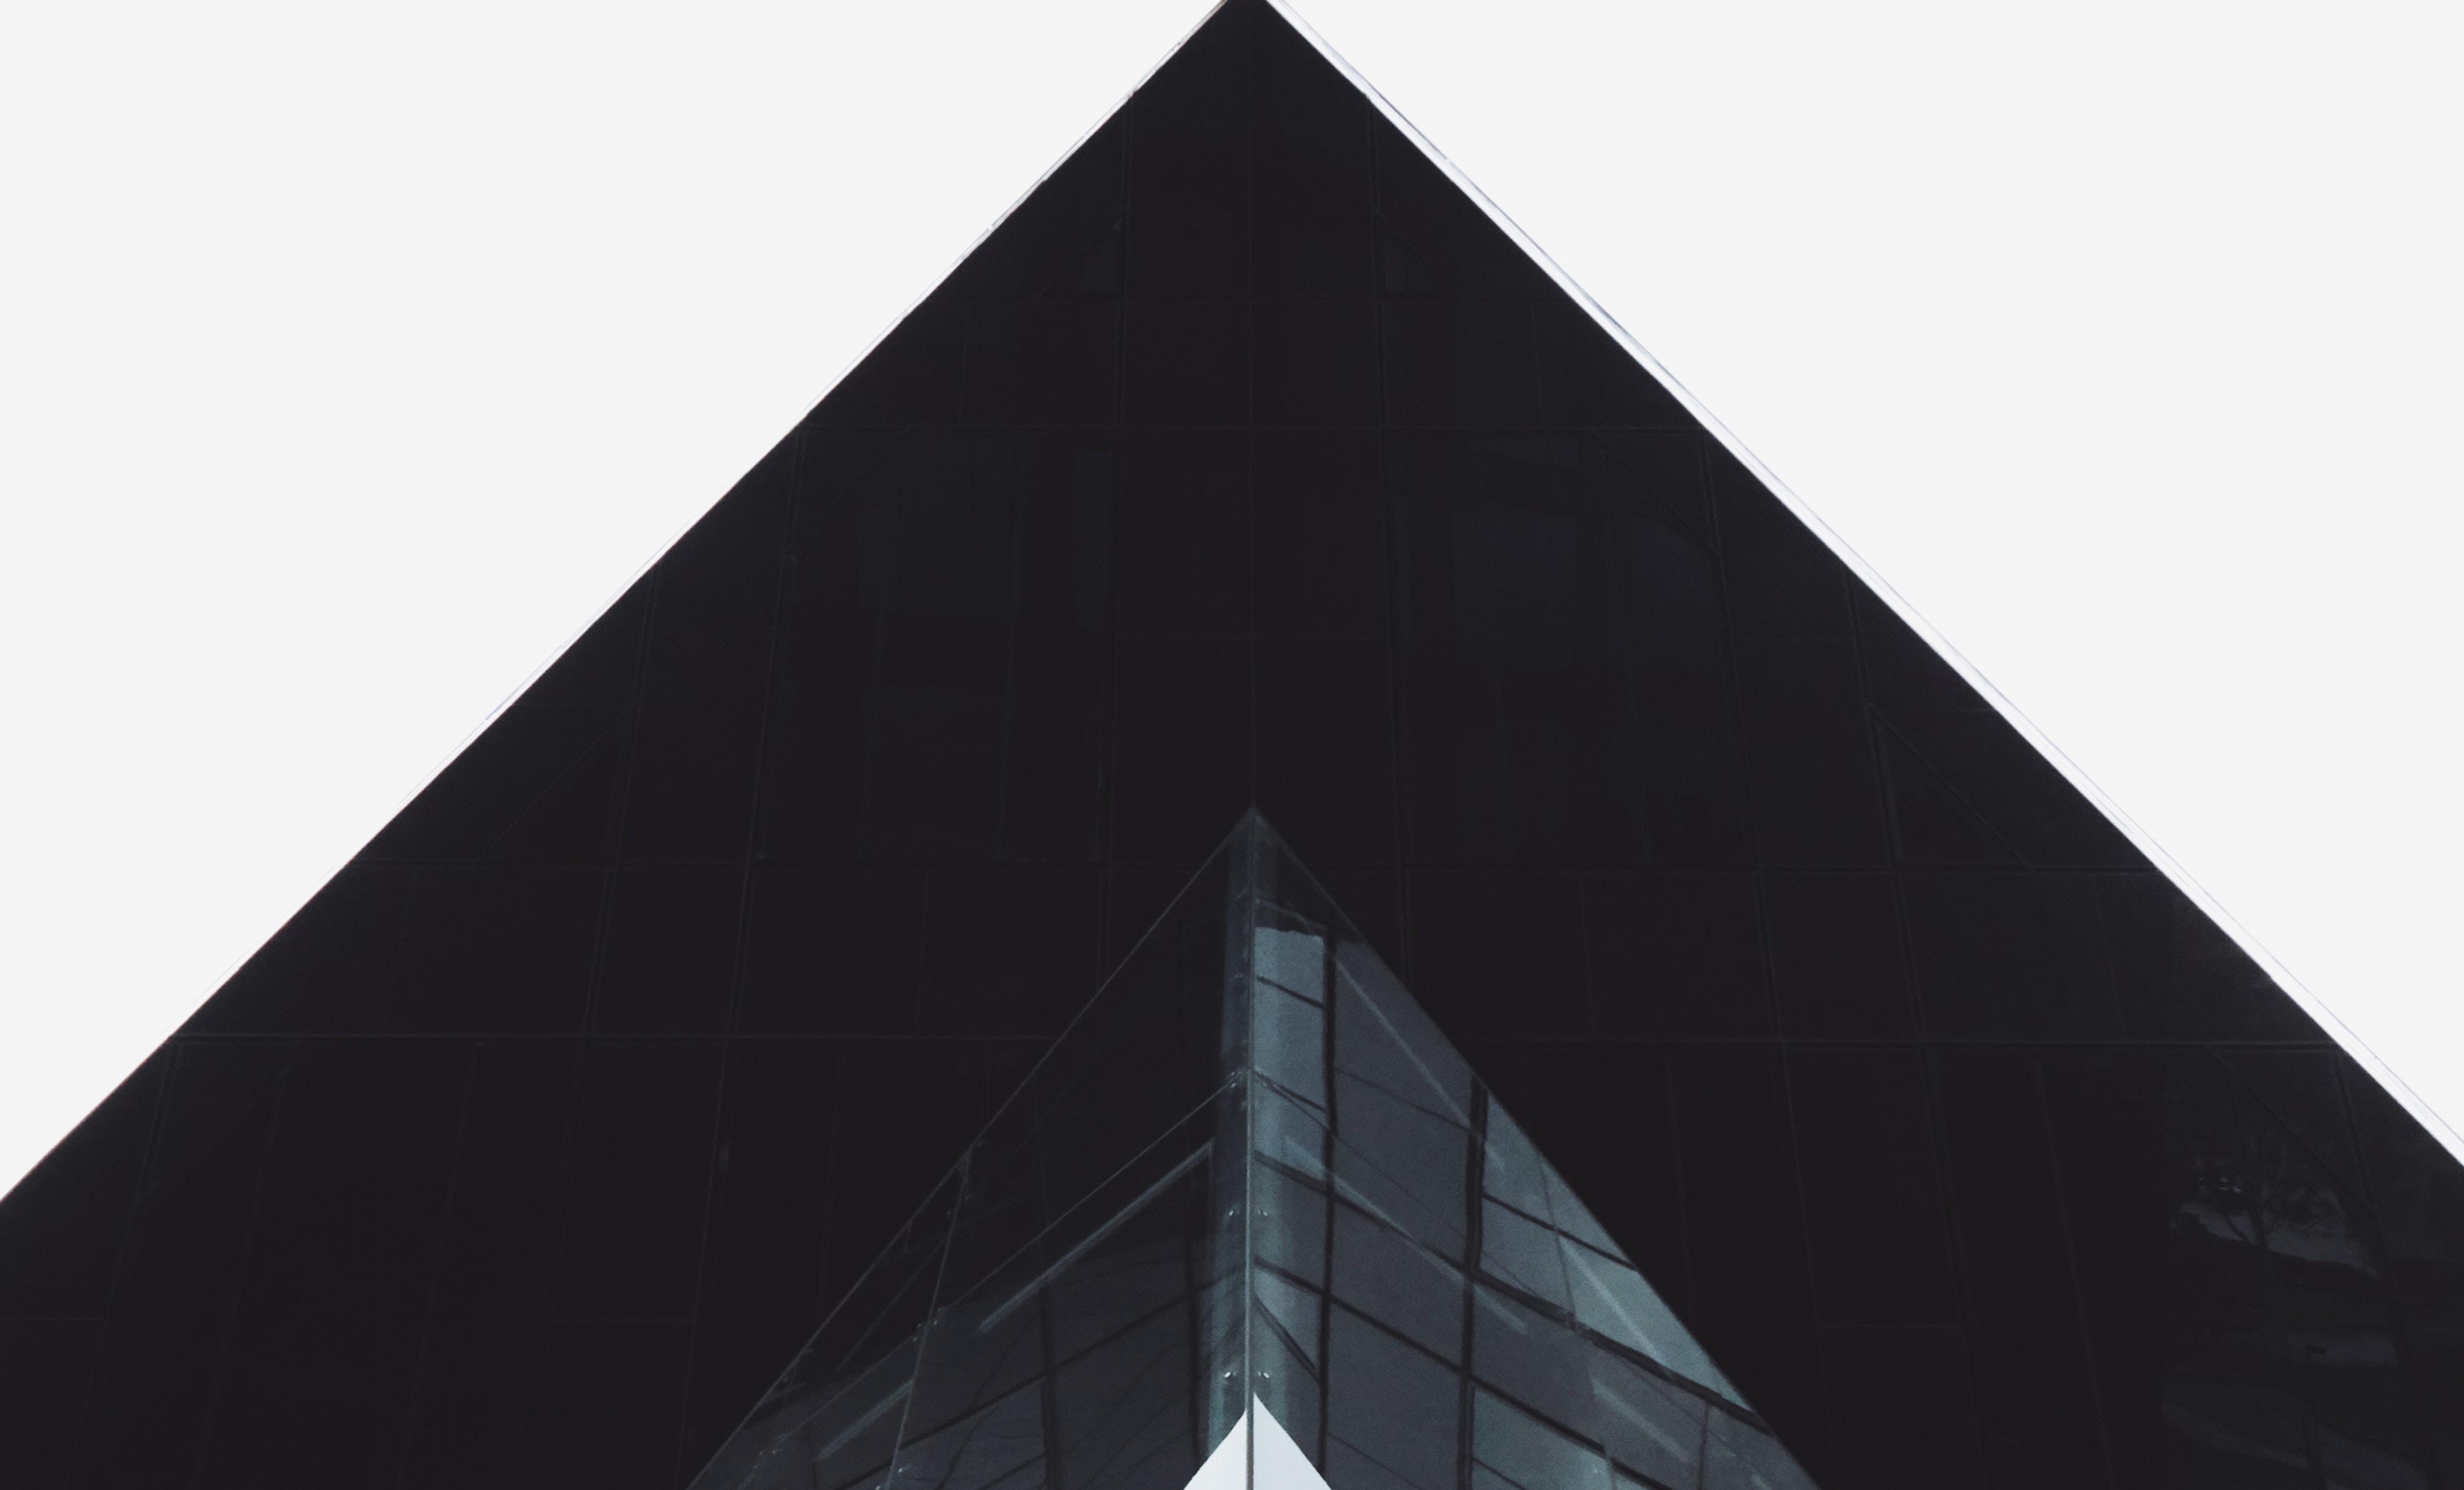 david-keegan-183675_2